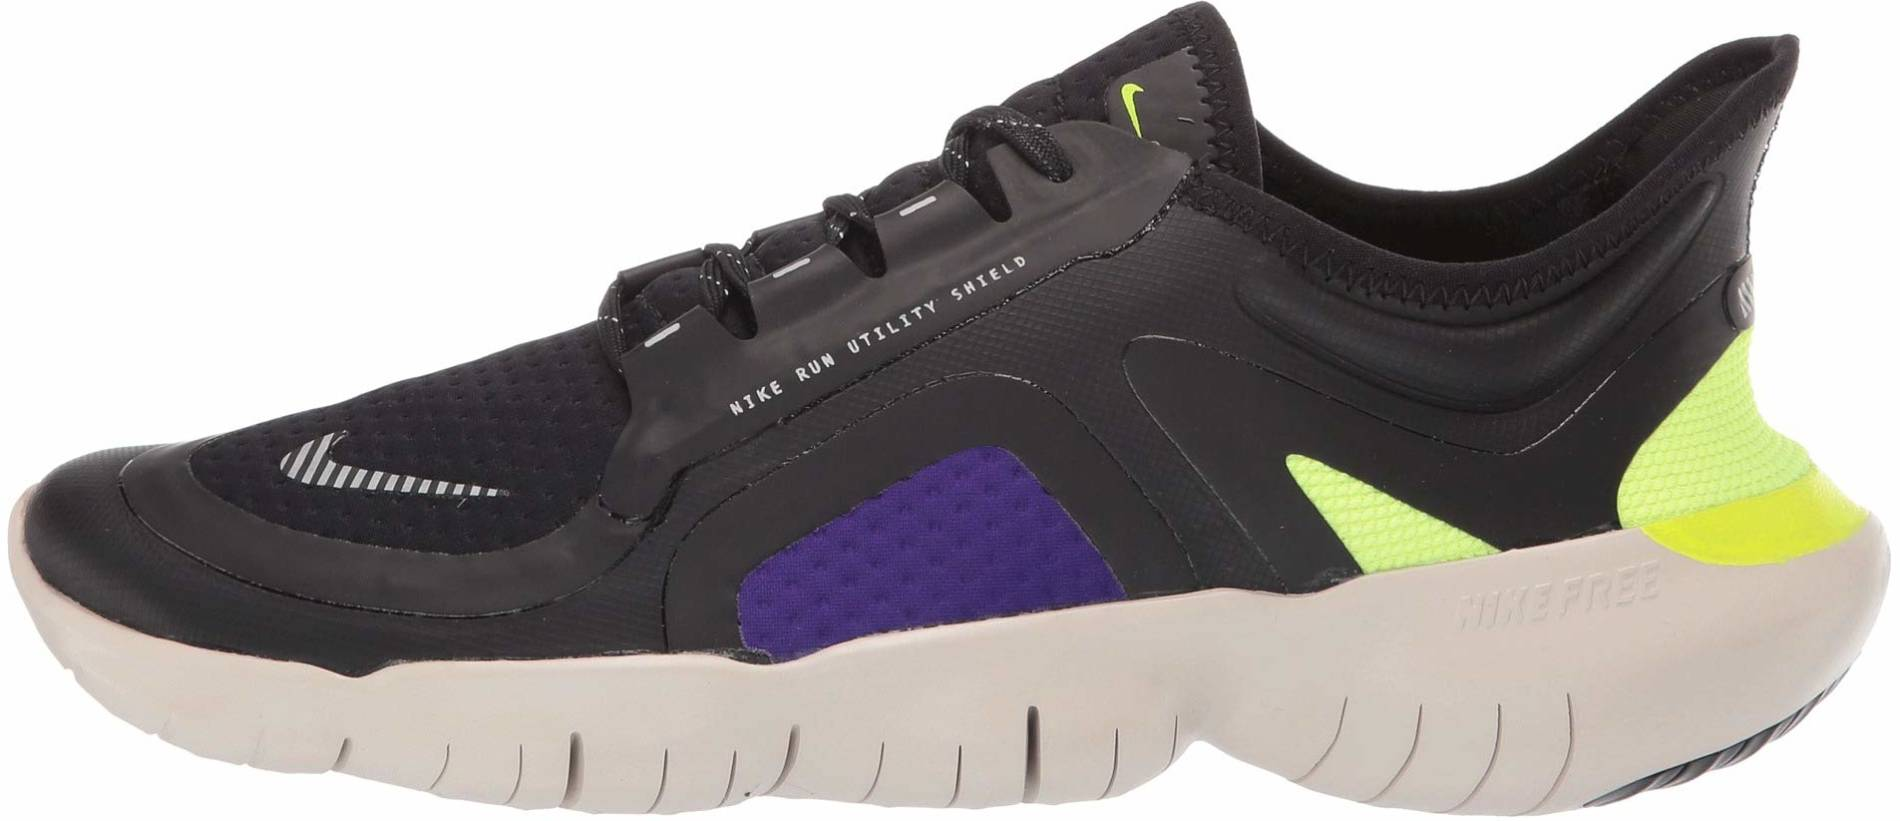 Ejecutar Moral Sollozos  Nike Free RN 5.0 Shield - Deals ($60), Facts, Reviews (2021)   RunRepeat